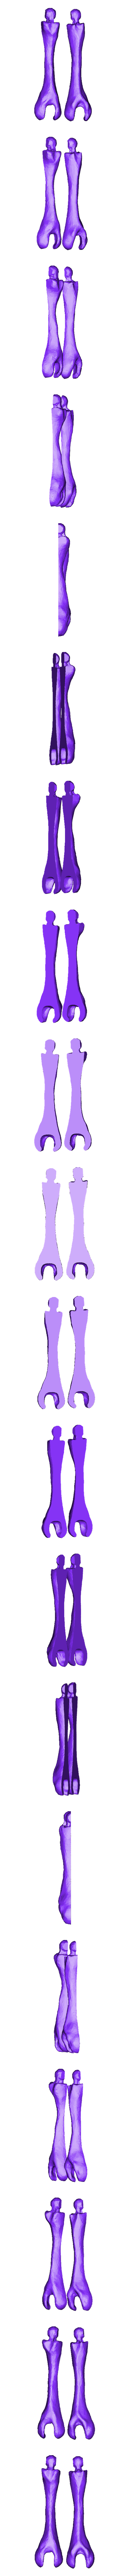 TopKnuckle_PLA.stl Download free STL file Agisis Ultimate Alien Face Hugger (40in x 23in - LIFE SIZE!) • Model to 3D print, Hoofbaugh